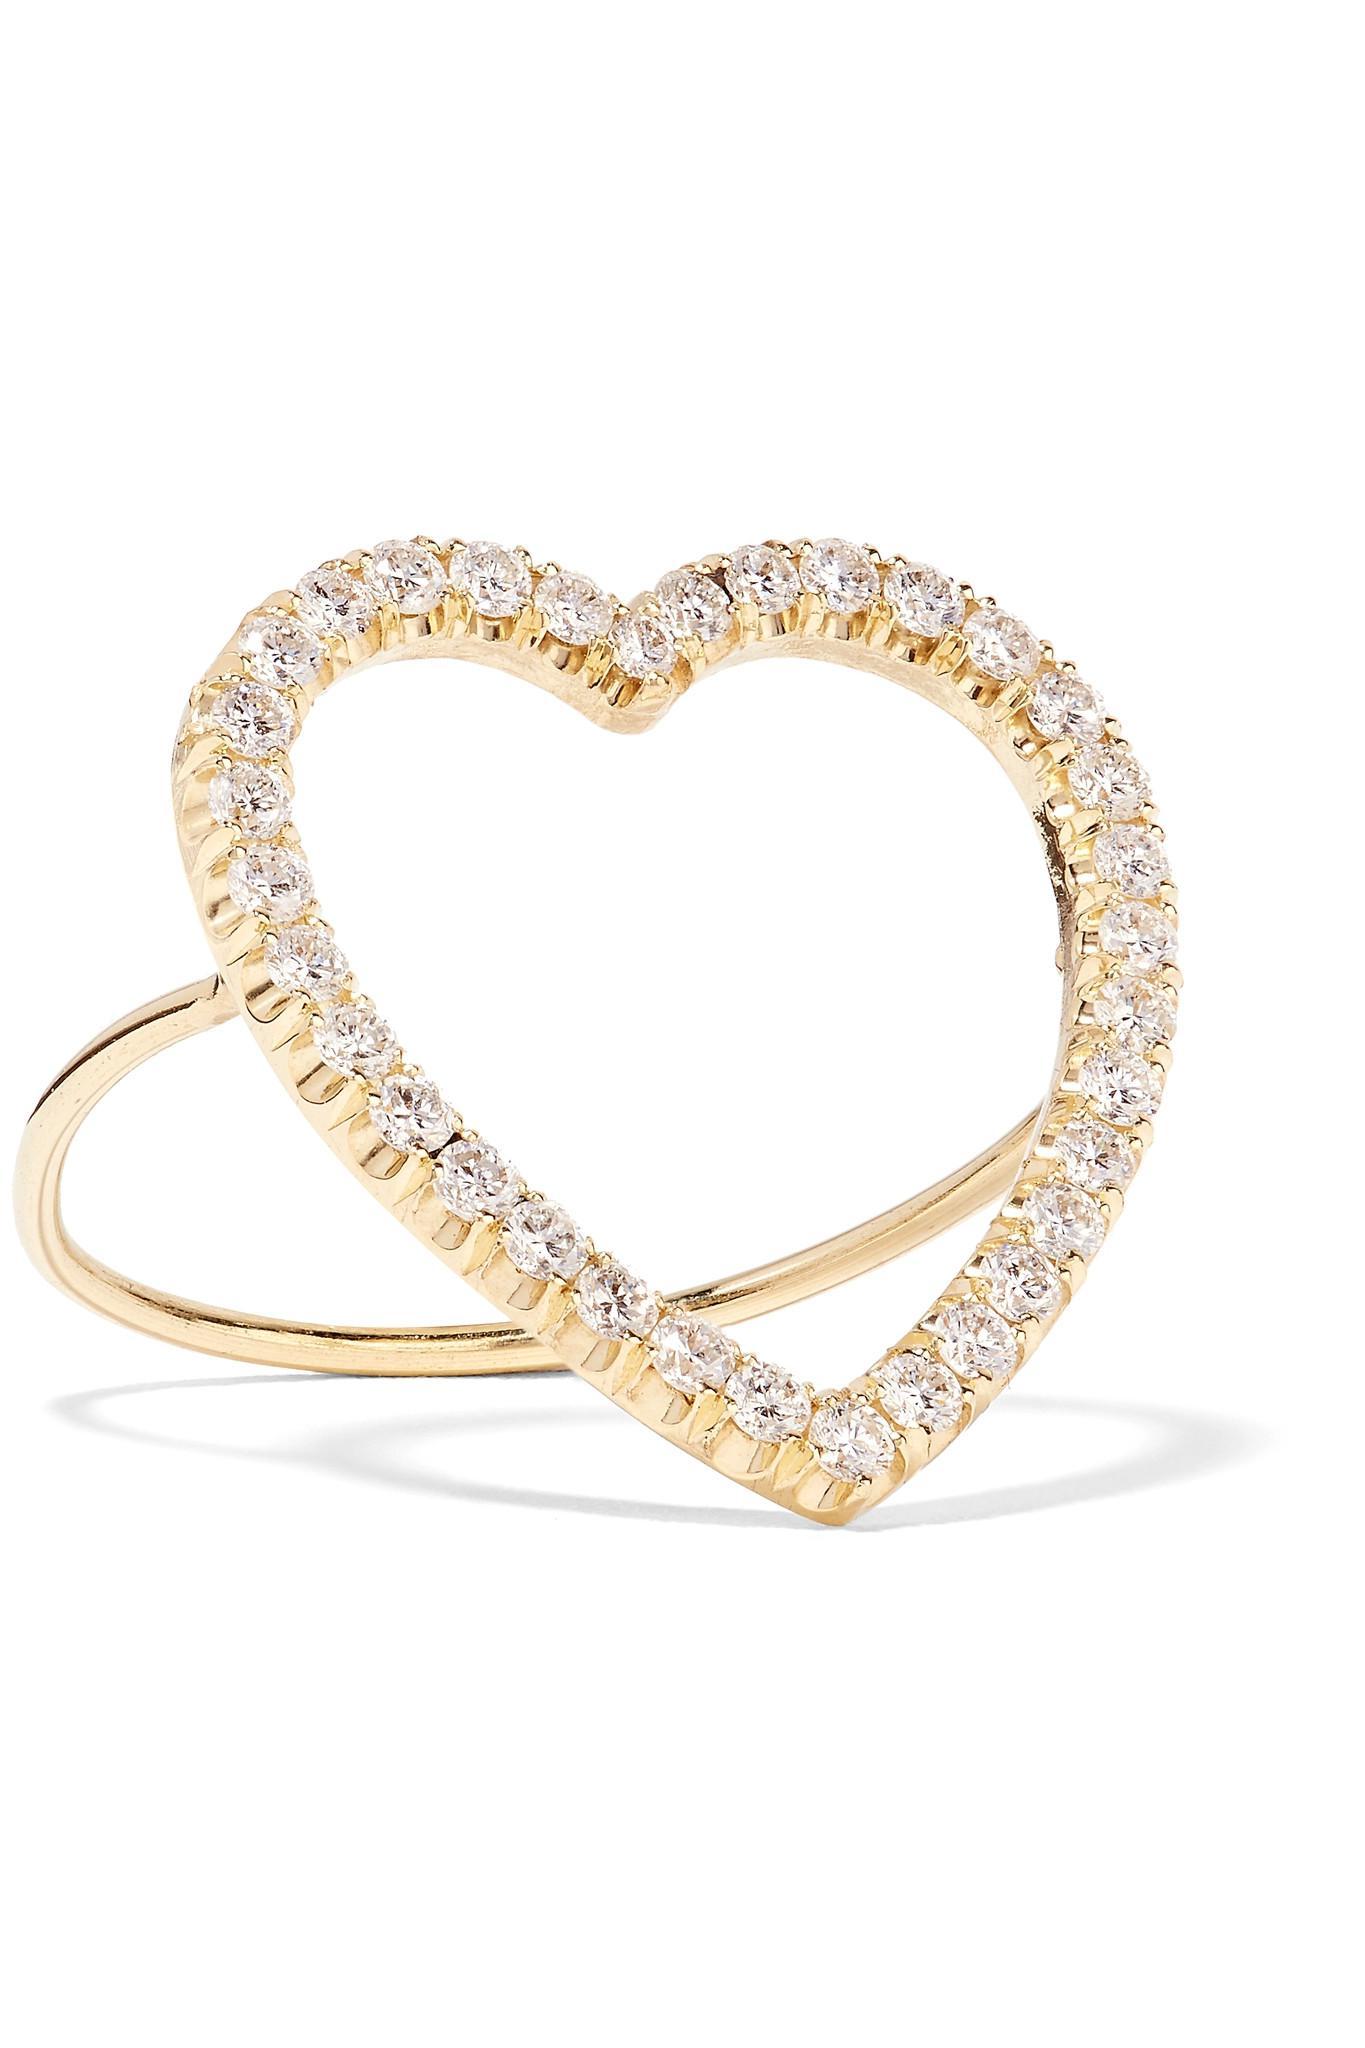 Heart 18-karat Gold, Opal And Diamond Ring - 6 Jennifer Meyer